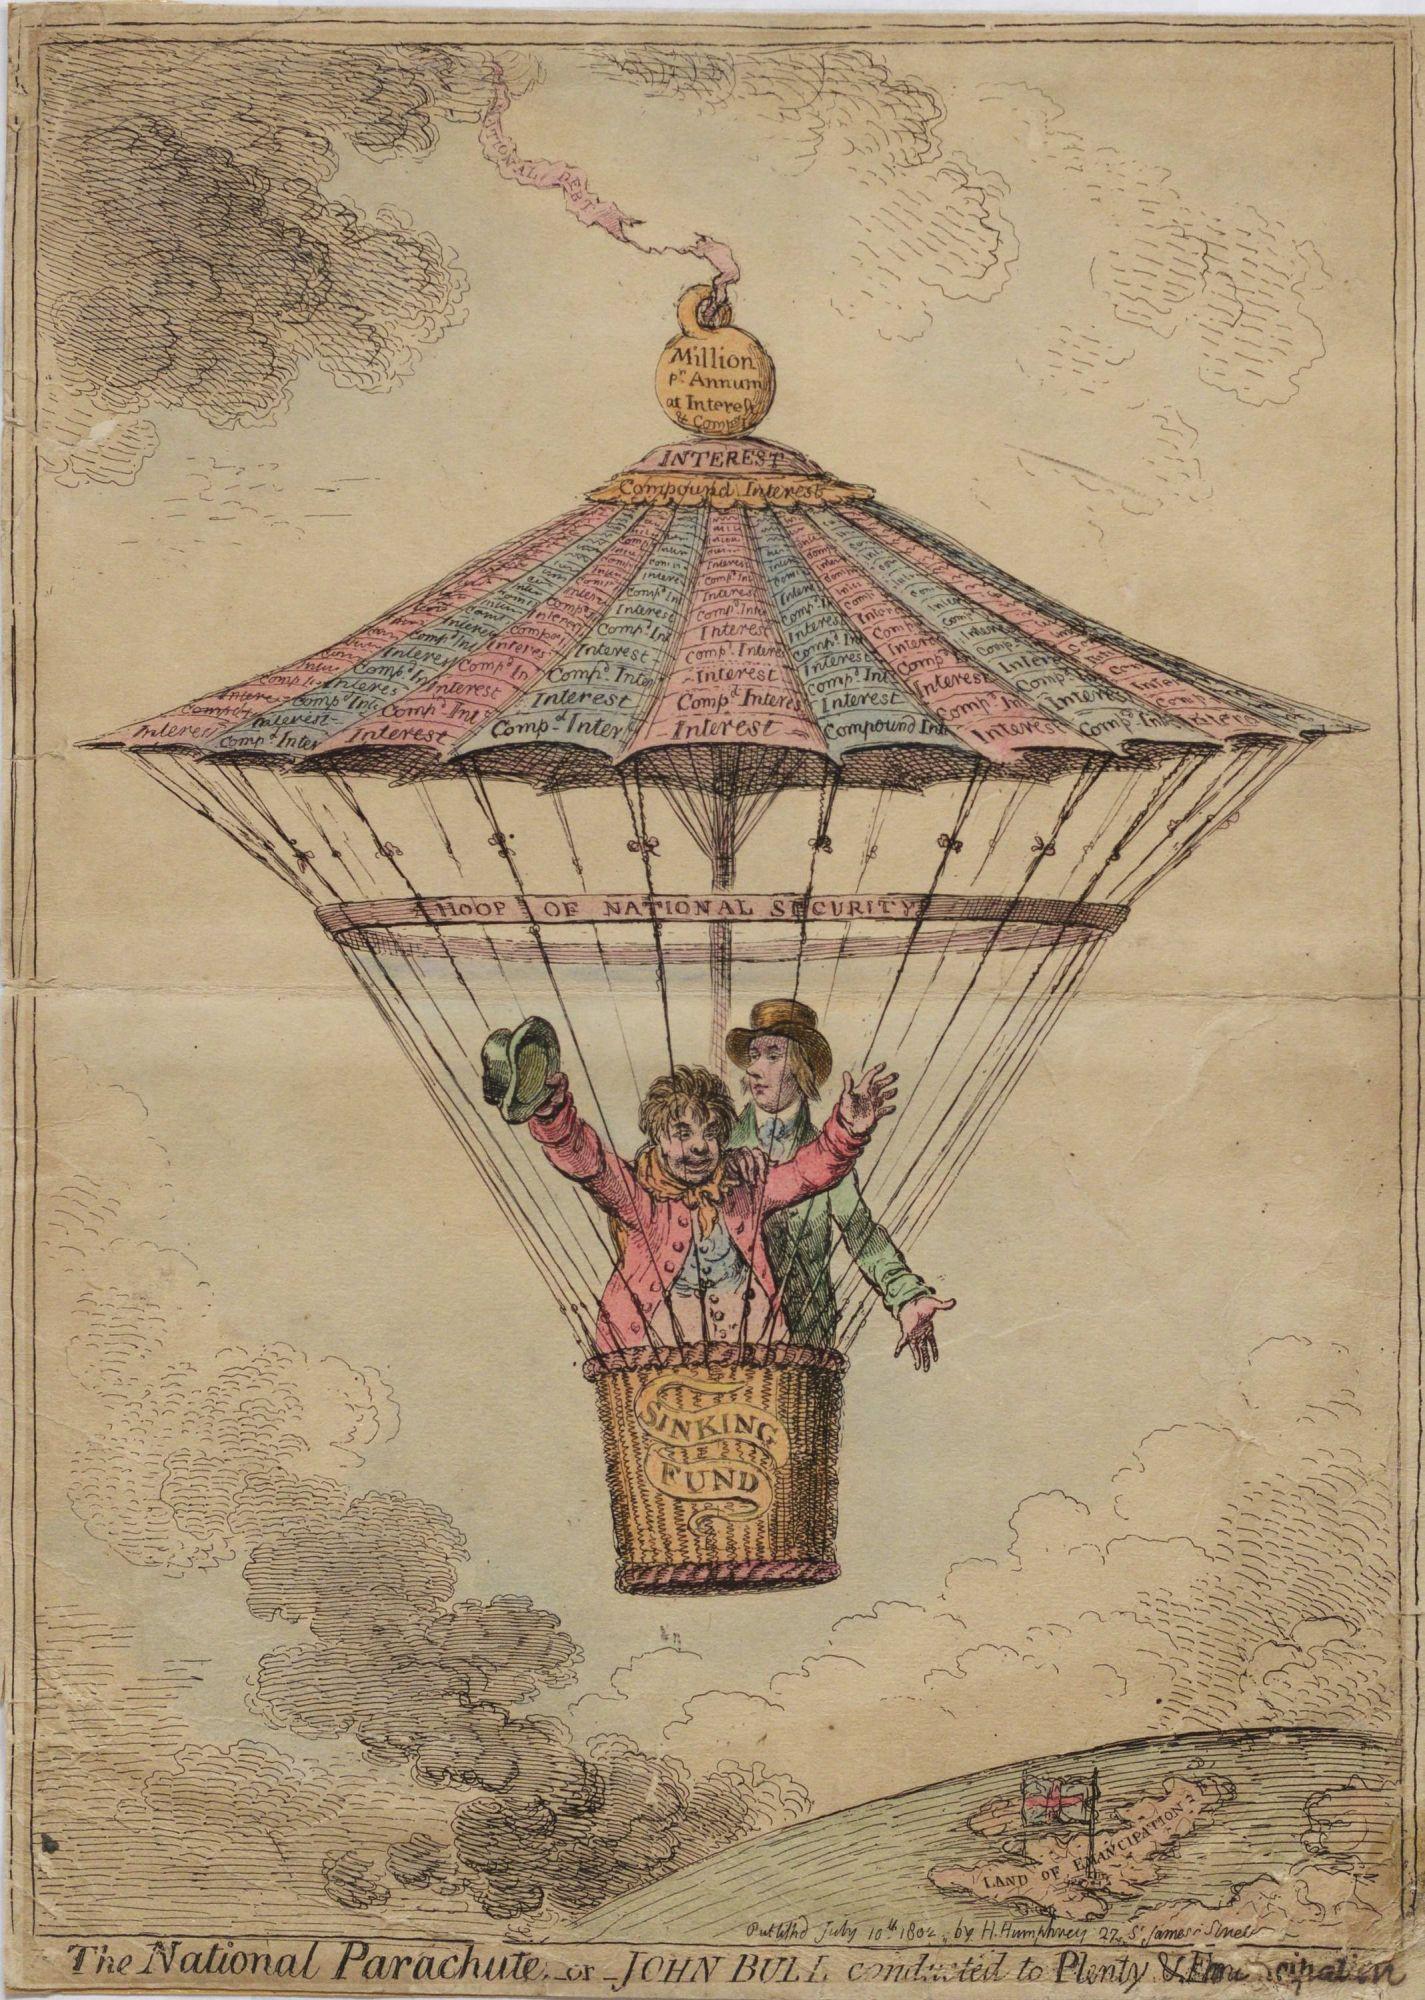 """The National Parachute..."" Political cartoon concerning England's financial problems. Two men in a basket parachute, descending rapidly"